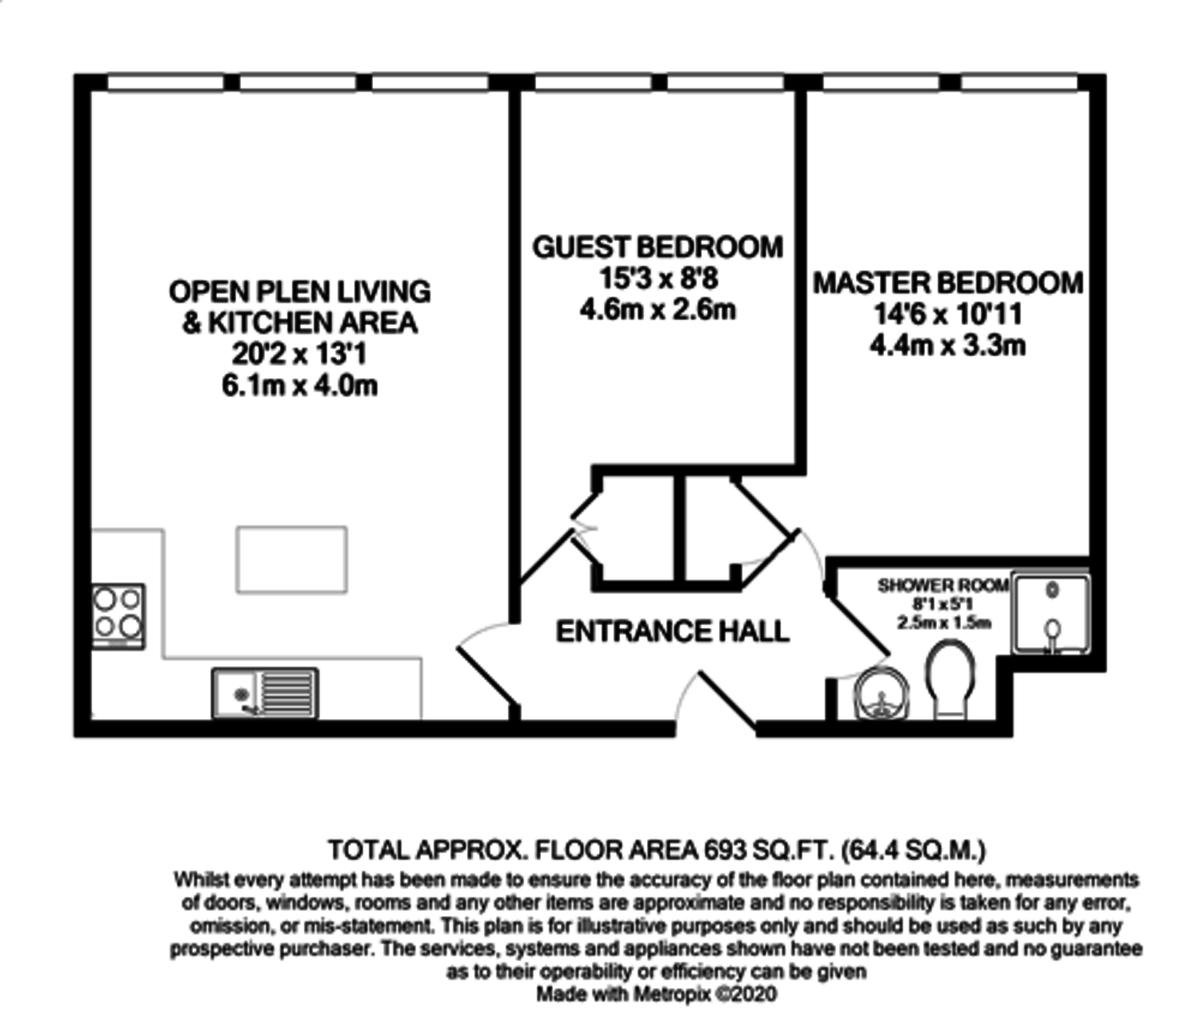 Millennium Apartment, 95 Newhall Street, Birmingham City Centre floorplan 1 of 1